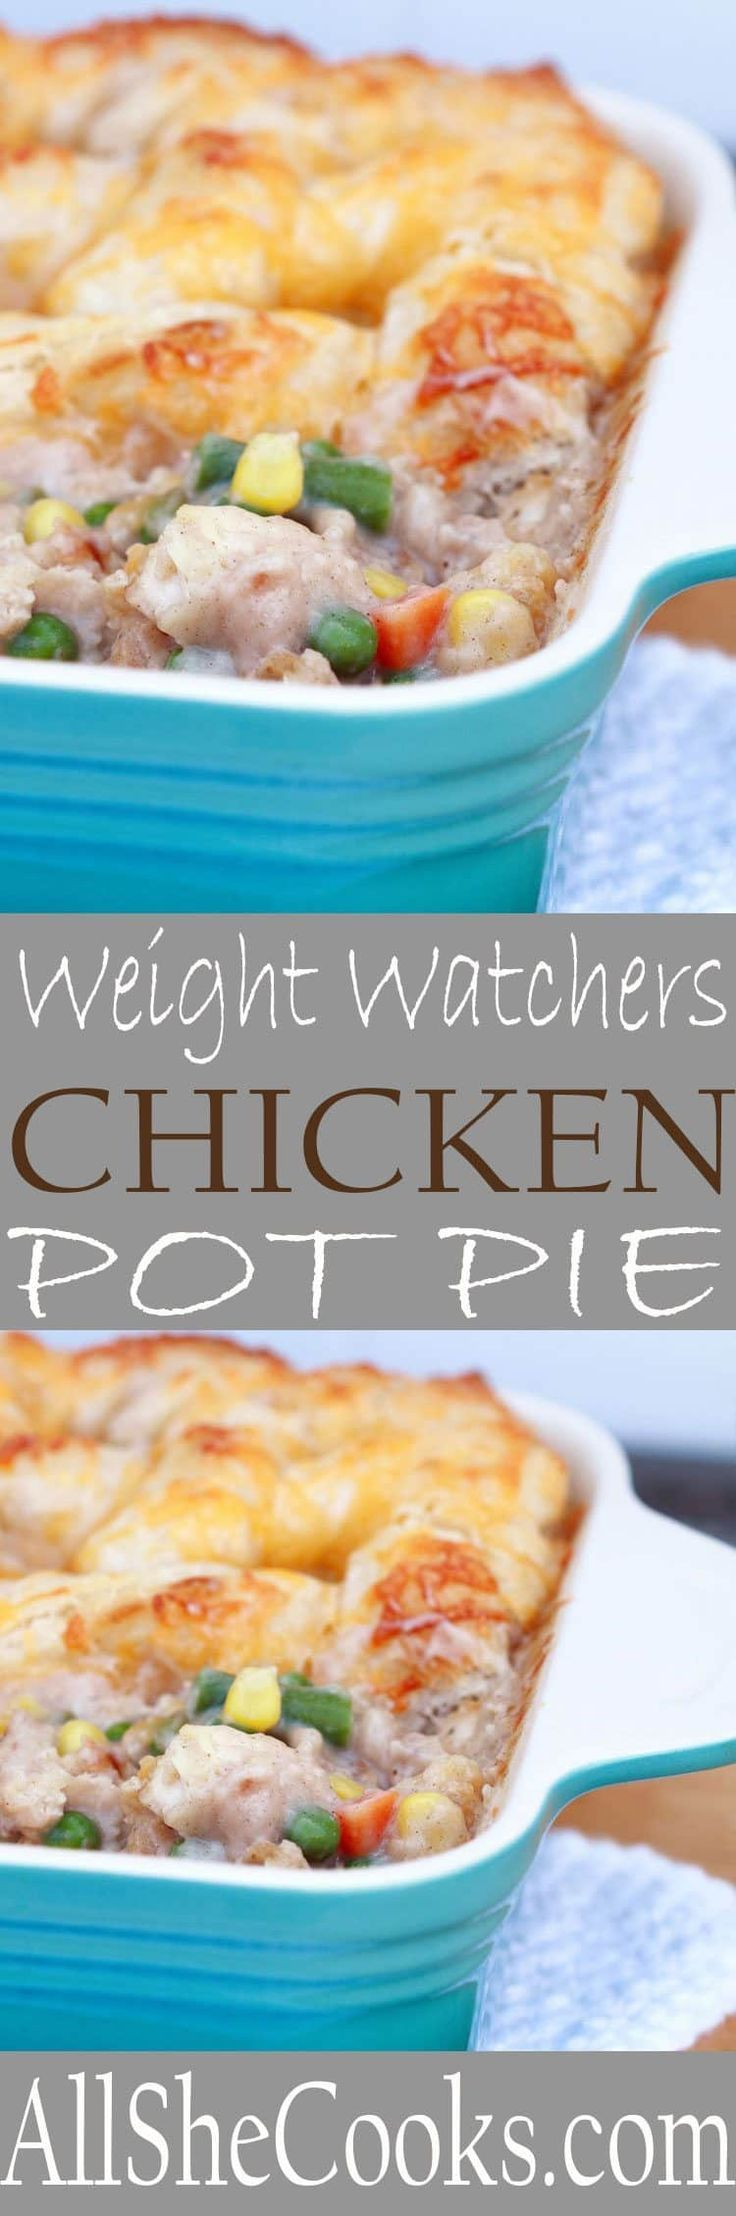 Enjoy Weight Watchers Chicken Pot Pie while watching your weight. Chicken pot pie doesn't have to mean high calories. Great flavor! best-low-fat-weight-watchers-chicken-pot-pie